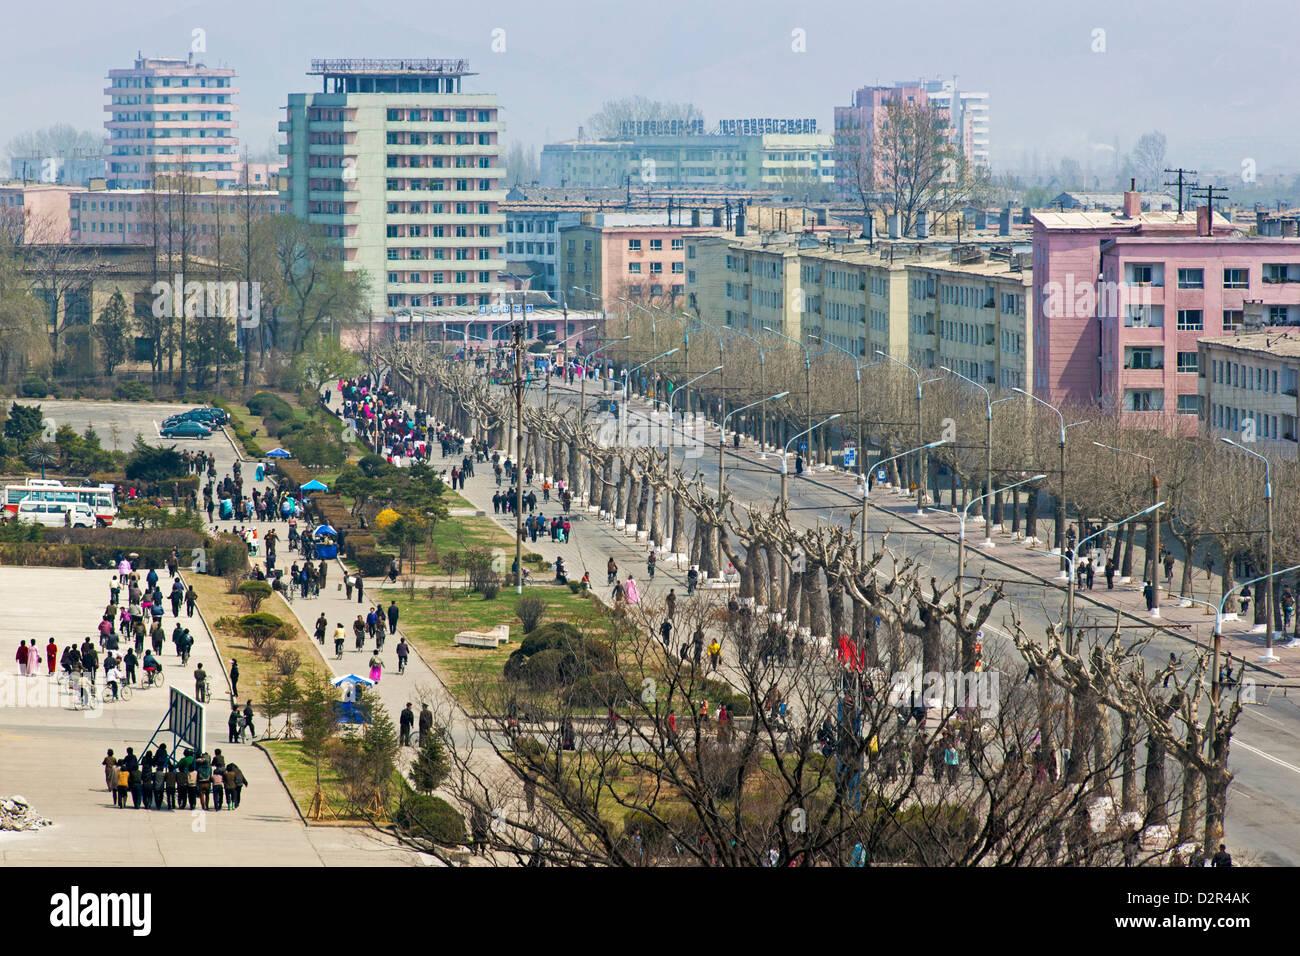 City streets, Hamhung, Democratic People's Republic of Korea (DPRK), North Korea, Asia - Stock Image